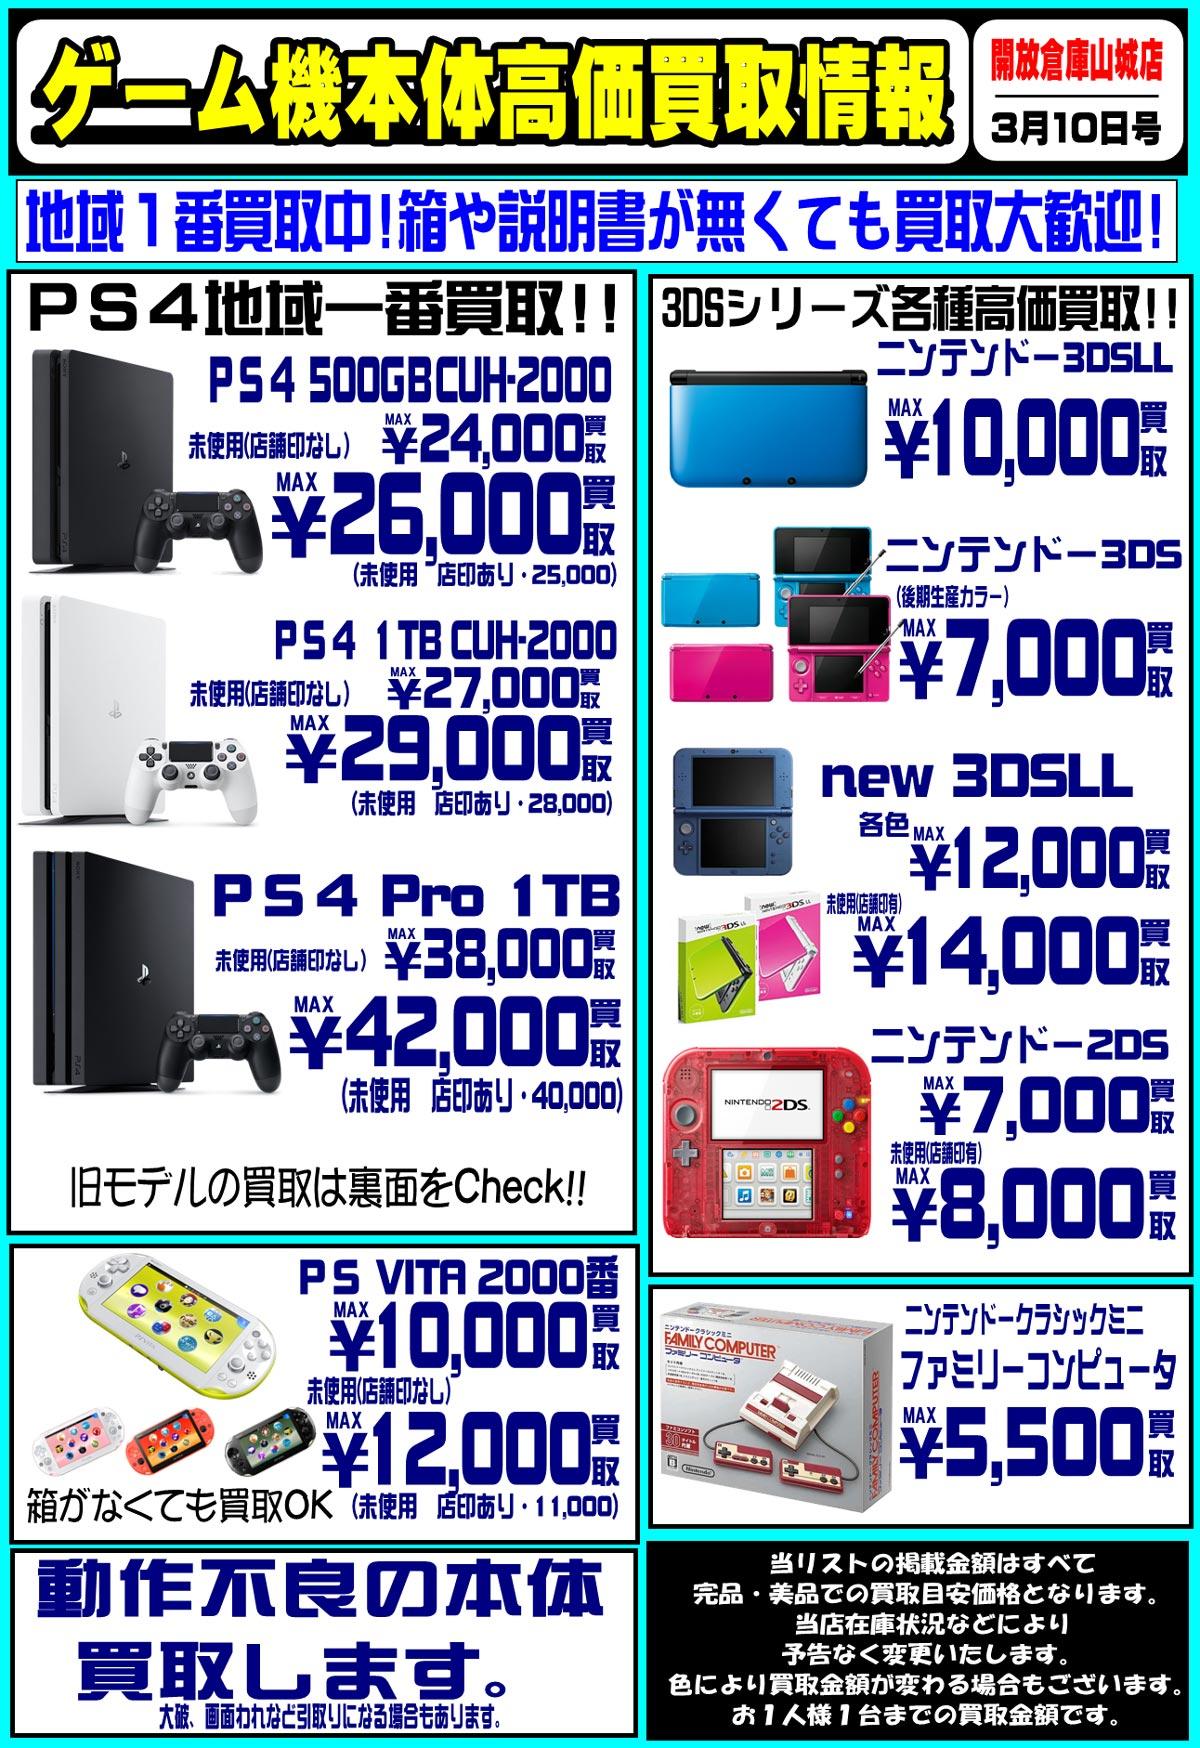 「開放倉庫山城店」2017年3月10日号ゲーム機本体買取情報!!